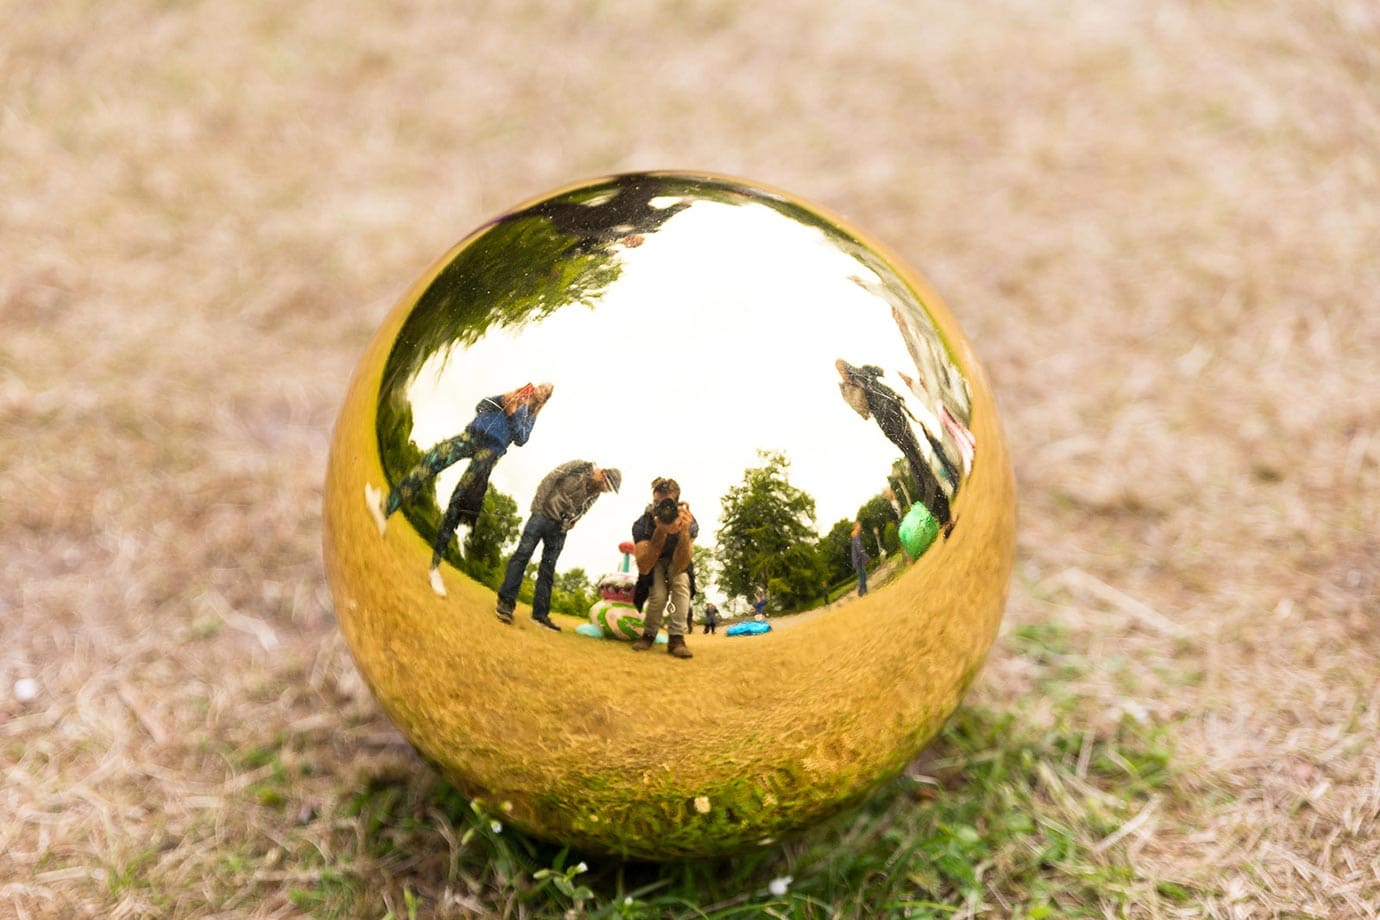 Golden Ball, Sculpture by the Sea Festival